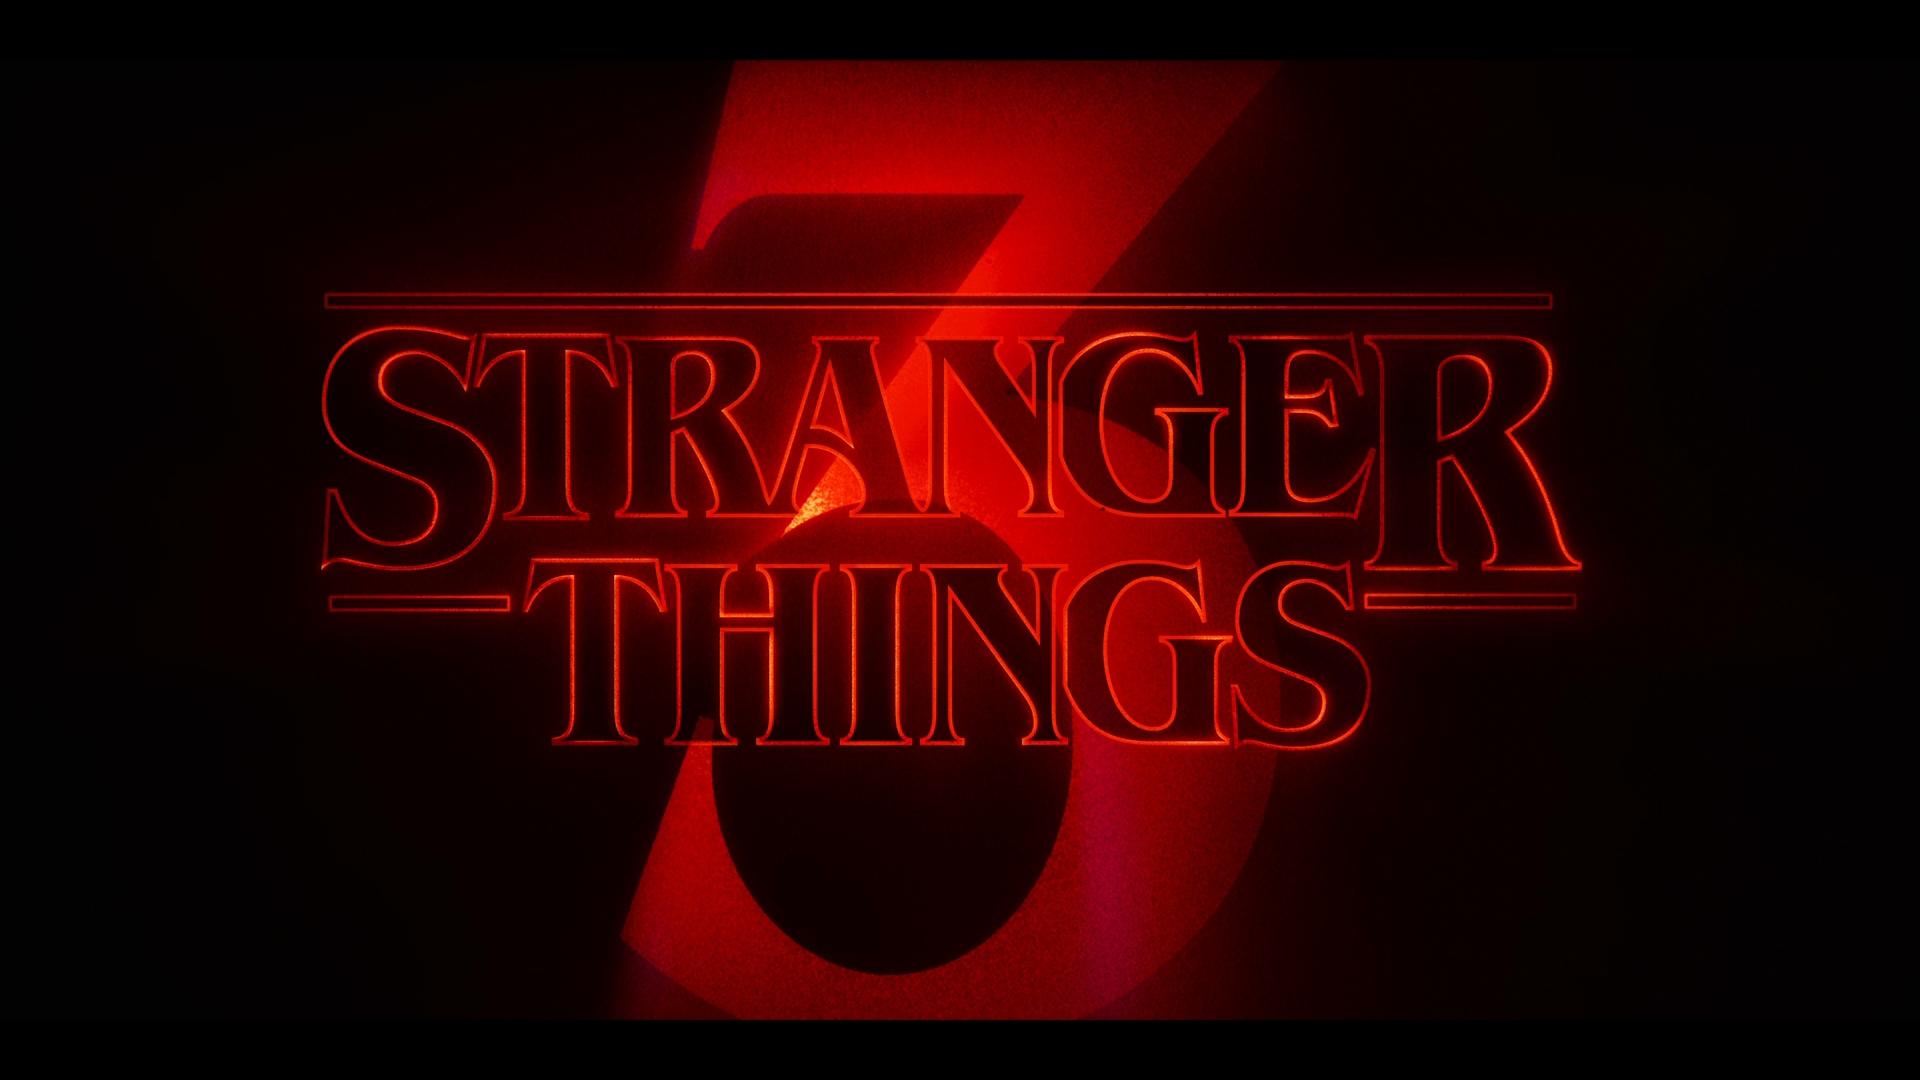 Descargar Stranger Things Temporada 3 Latino Sub Español Hd